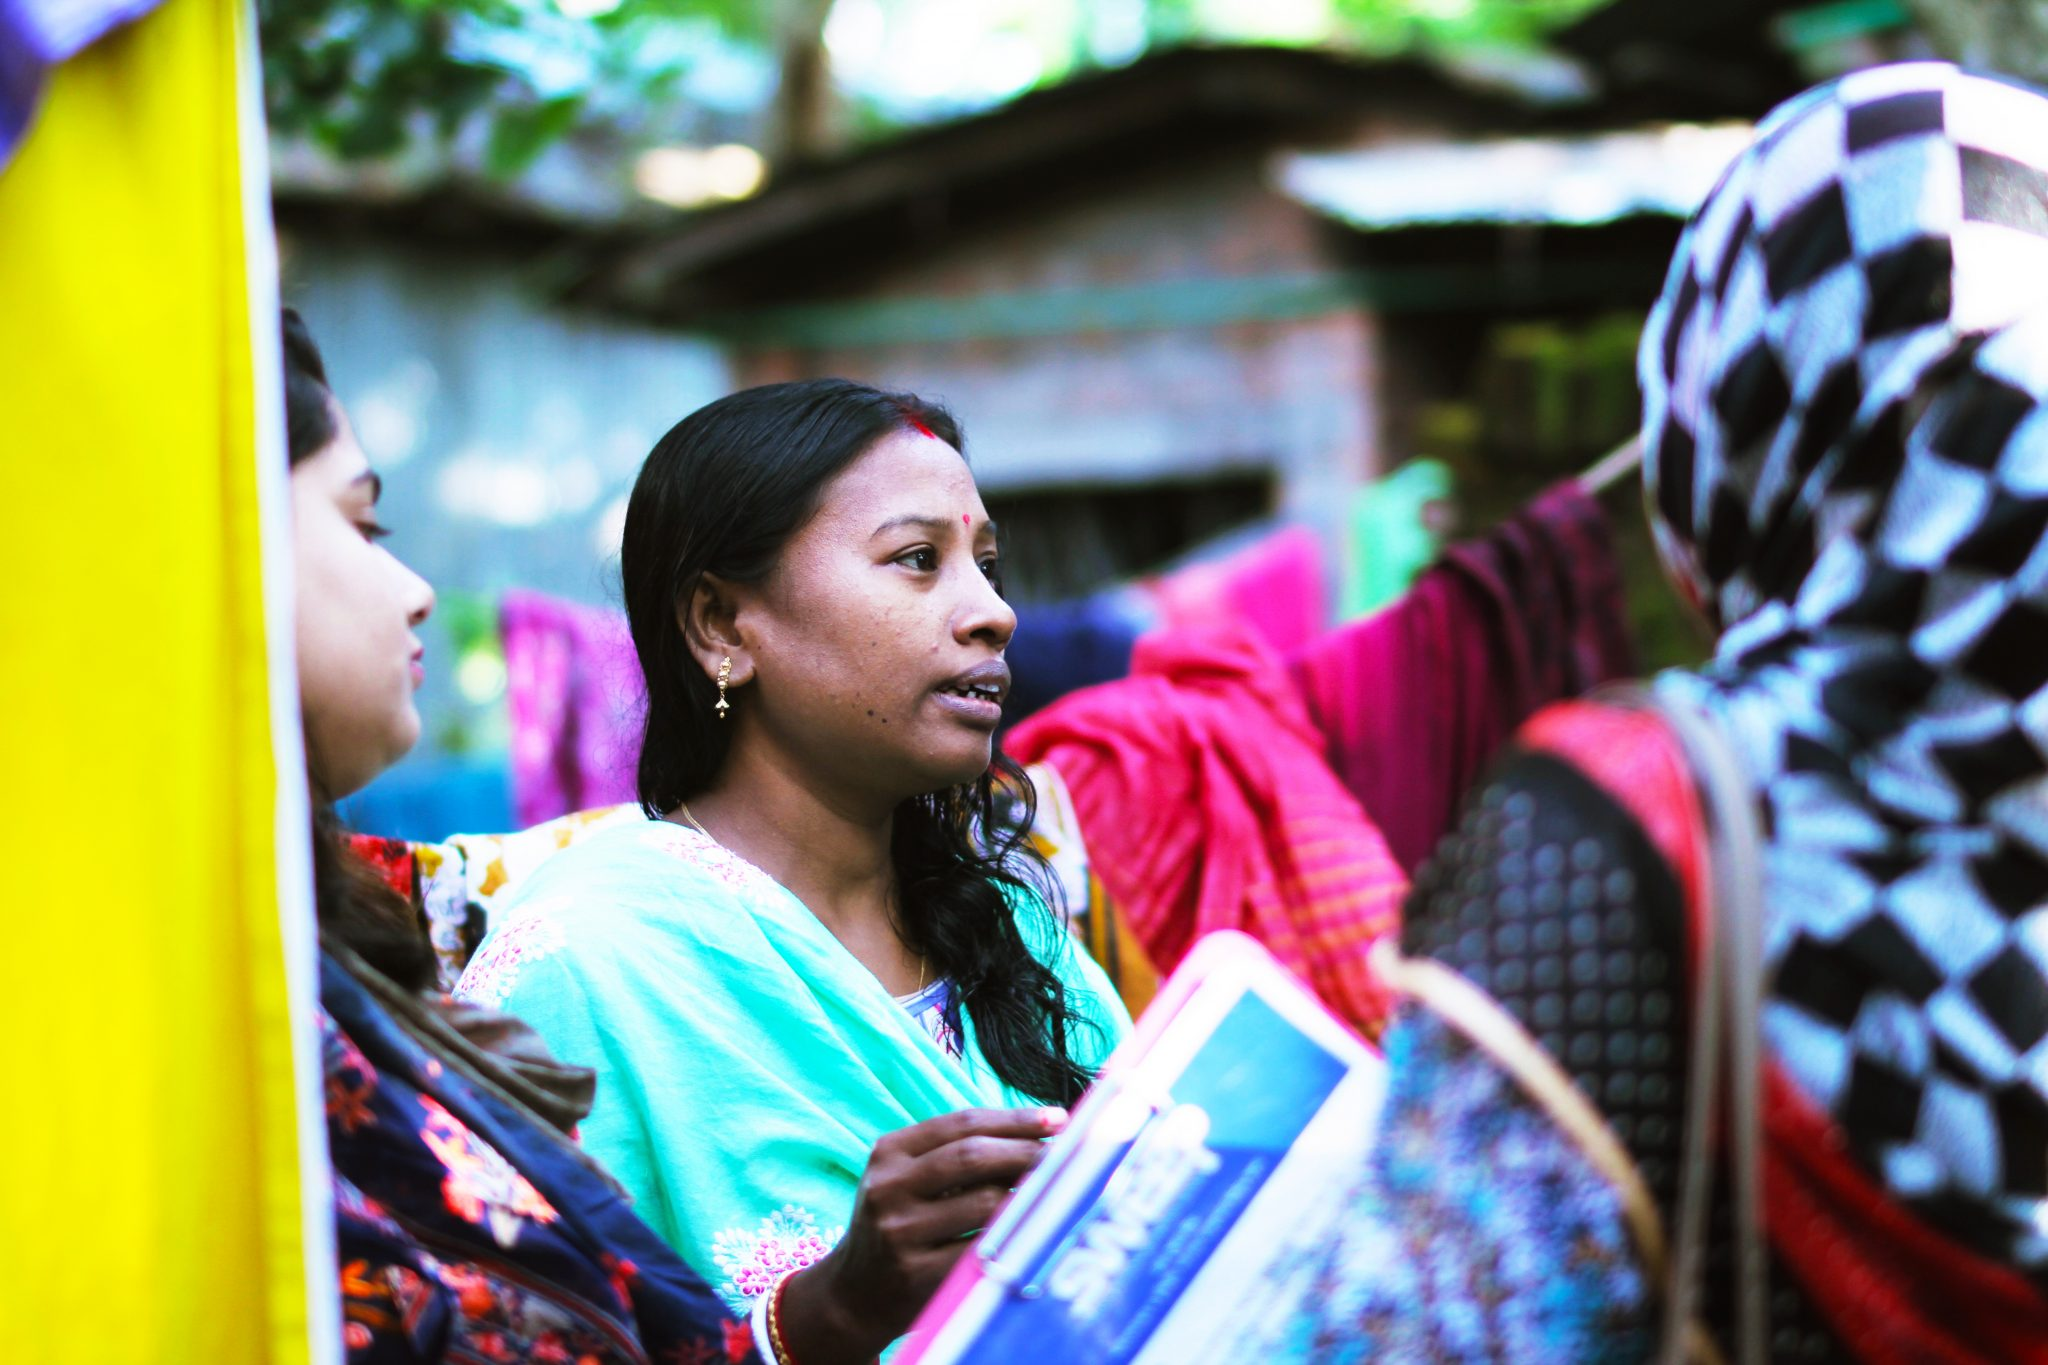 Rangpur citywide inclusive sanitation photoshoot